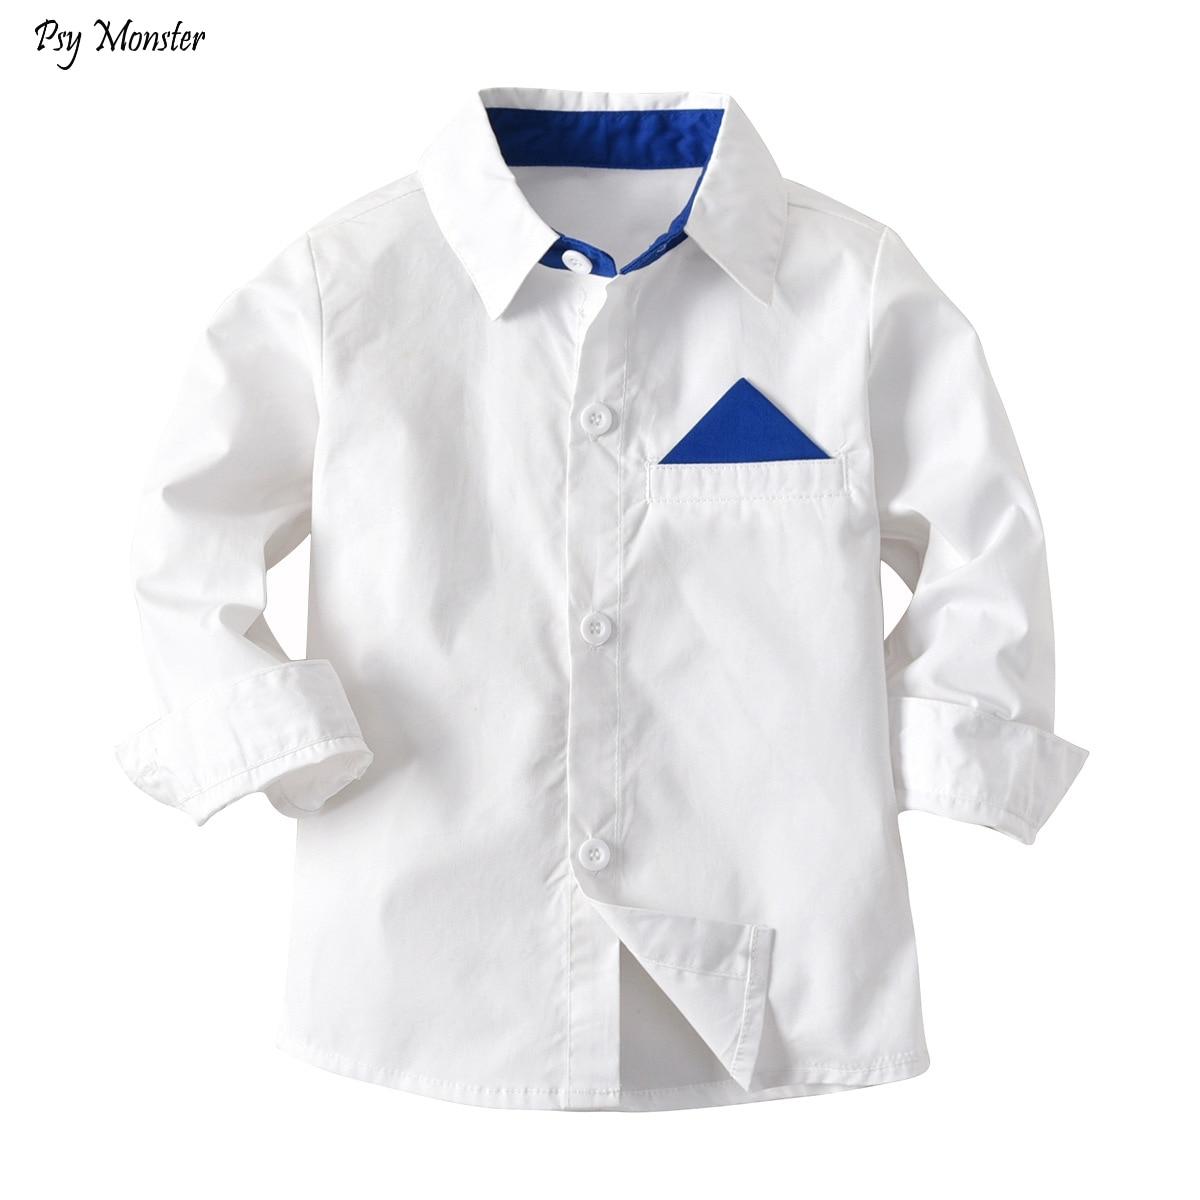 Boy's White Shirt Children's New Big Boy Shirt Kids Formal Wedding Party Long-sleeved Tops Clothes 2-10T